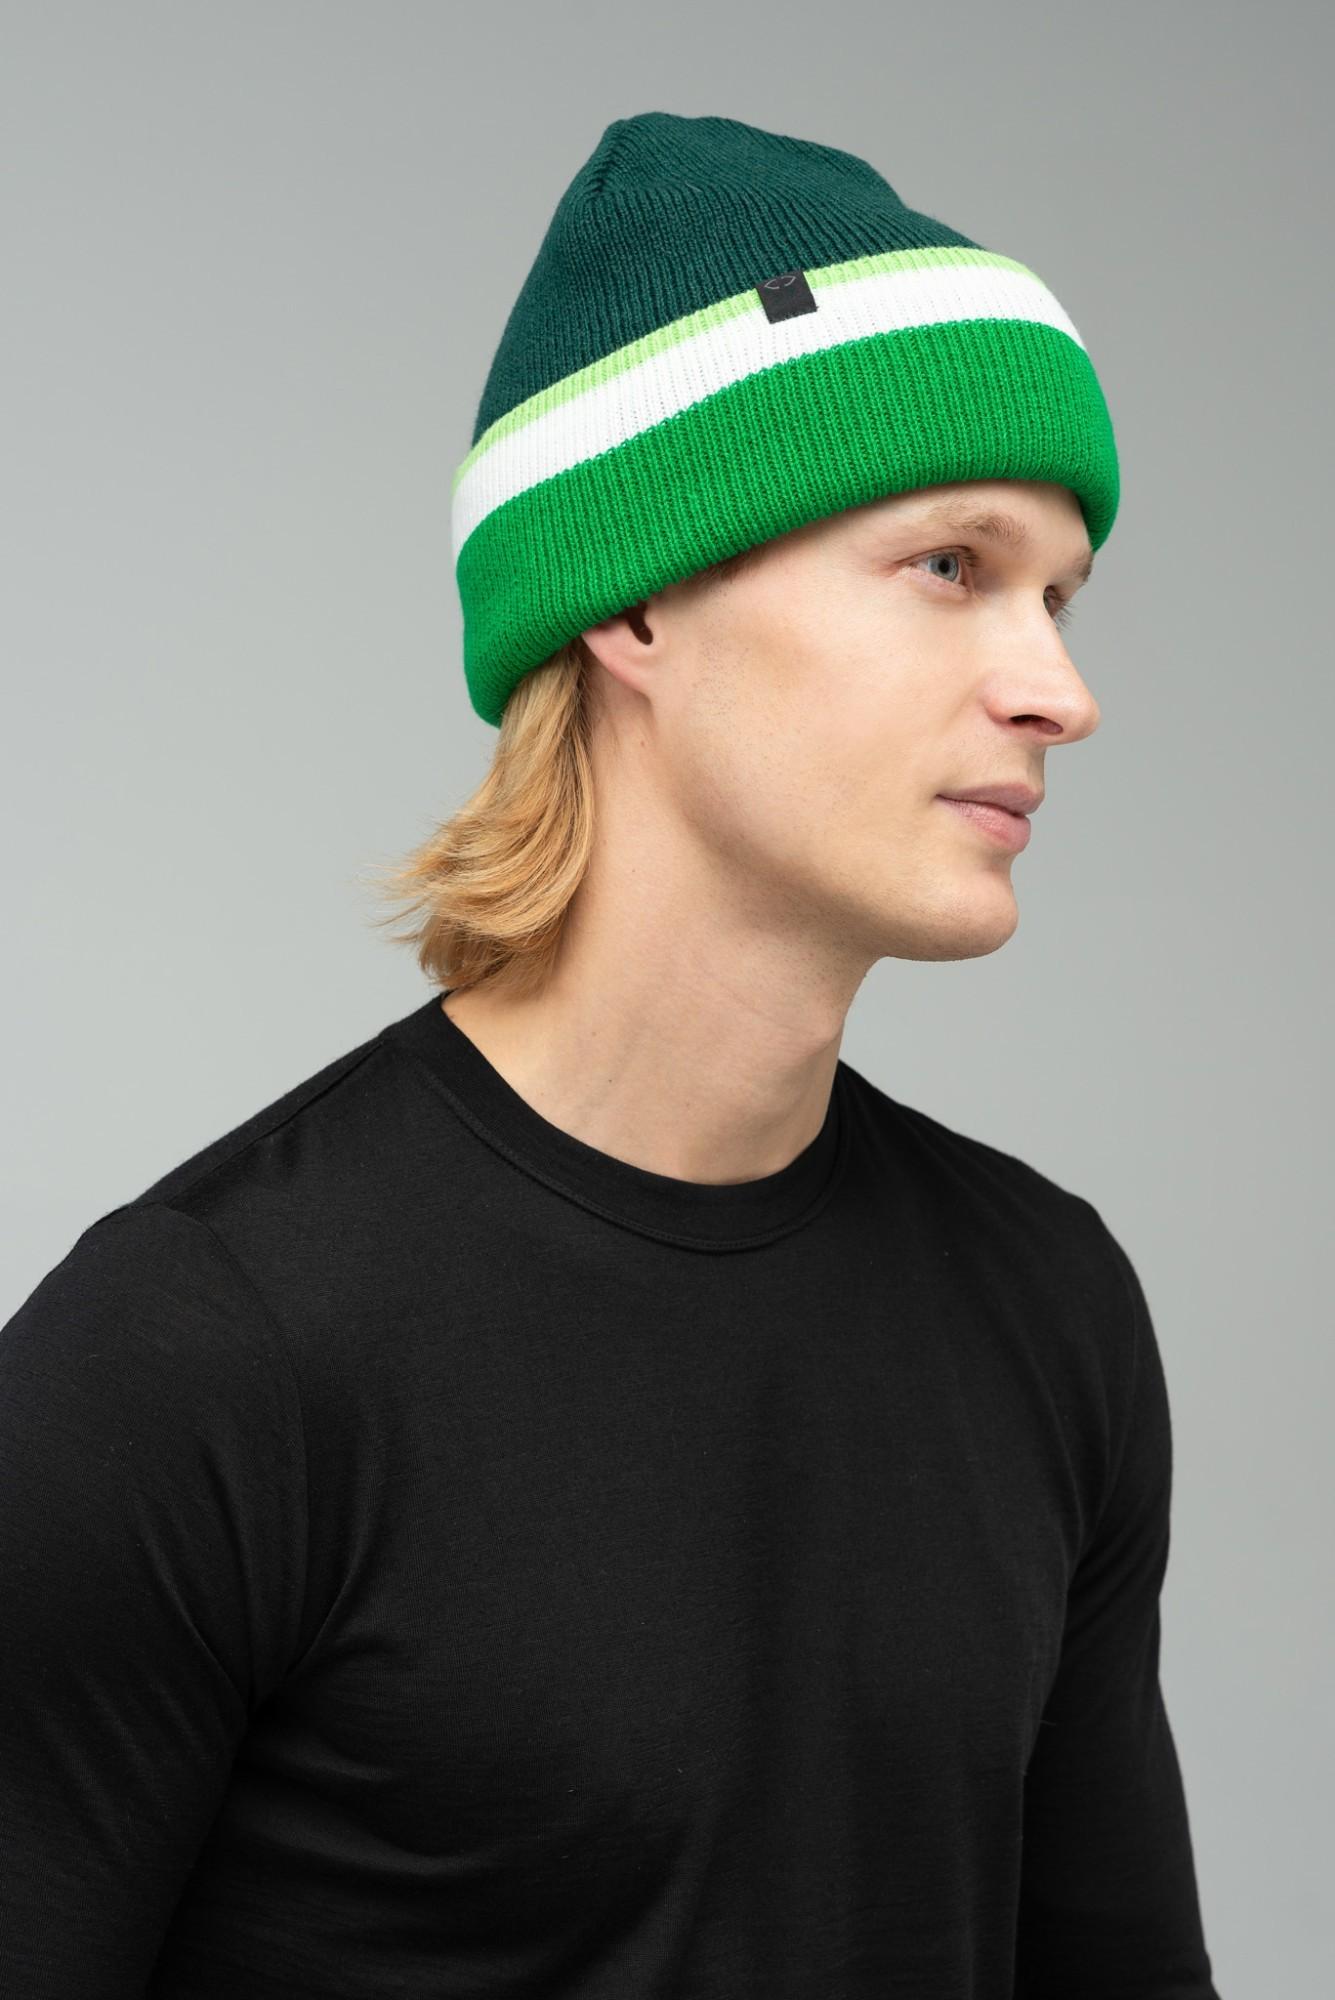 AUDIMAS Megzta kepurė su vilna NOS 1-06-341 Green One size